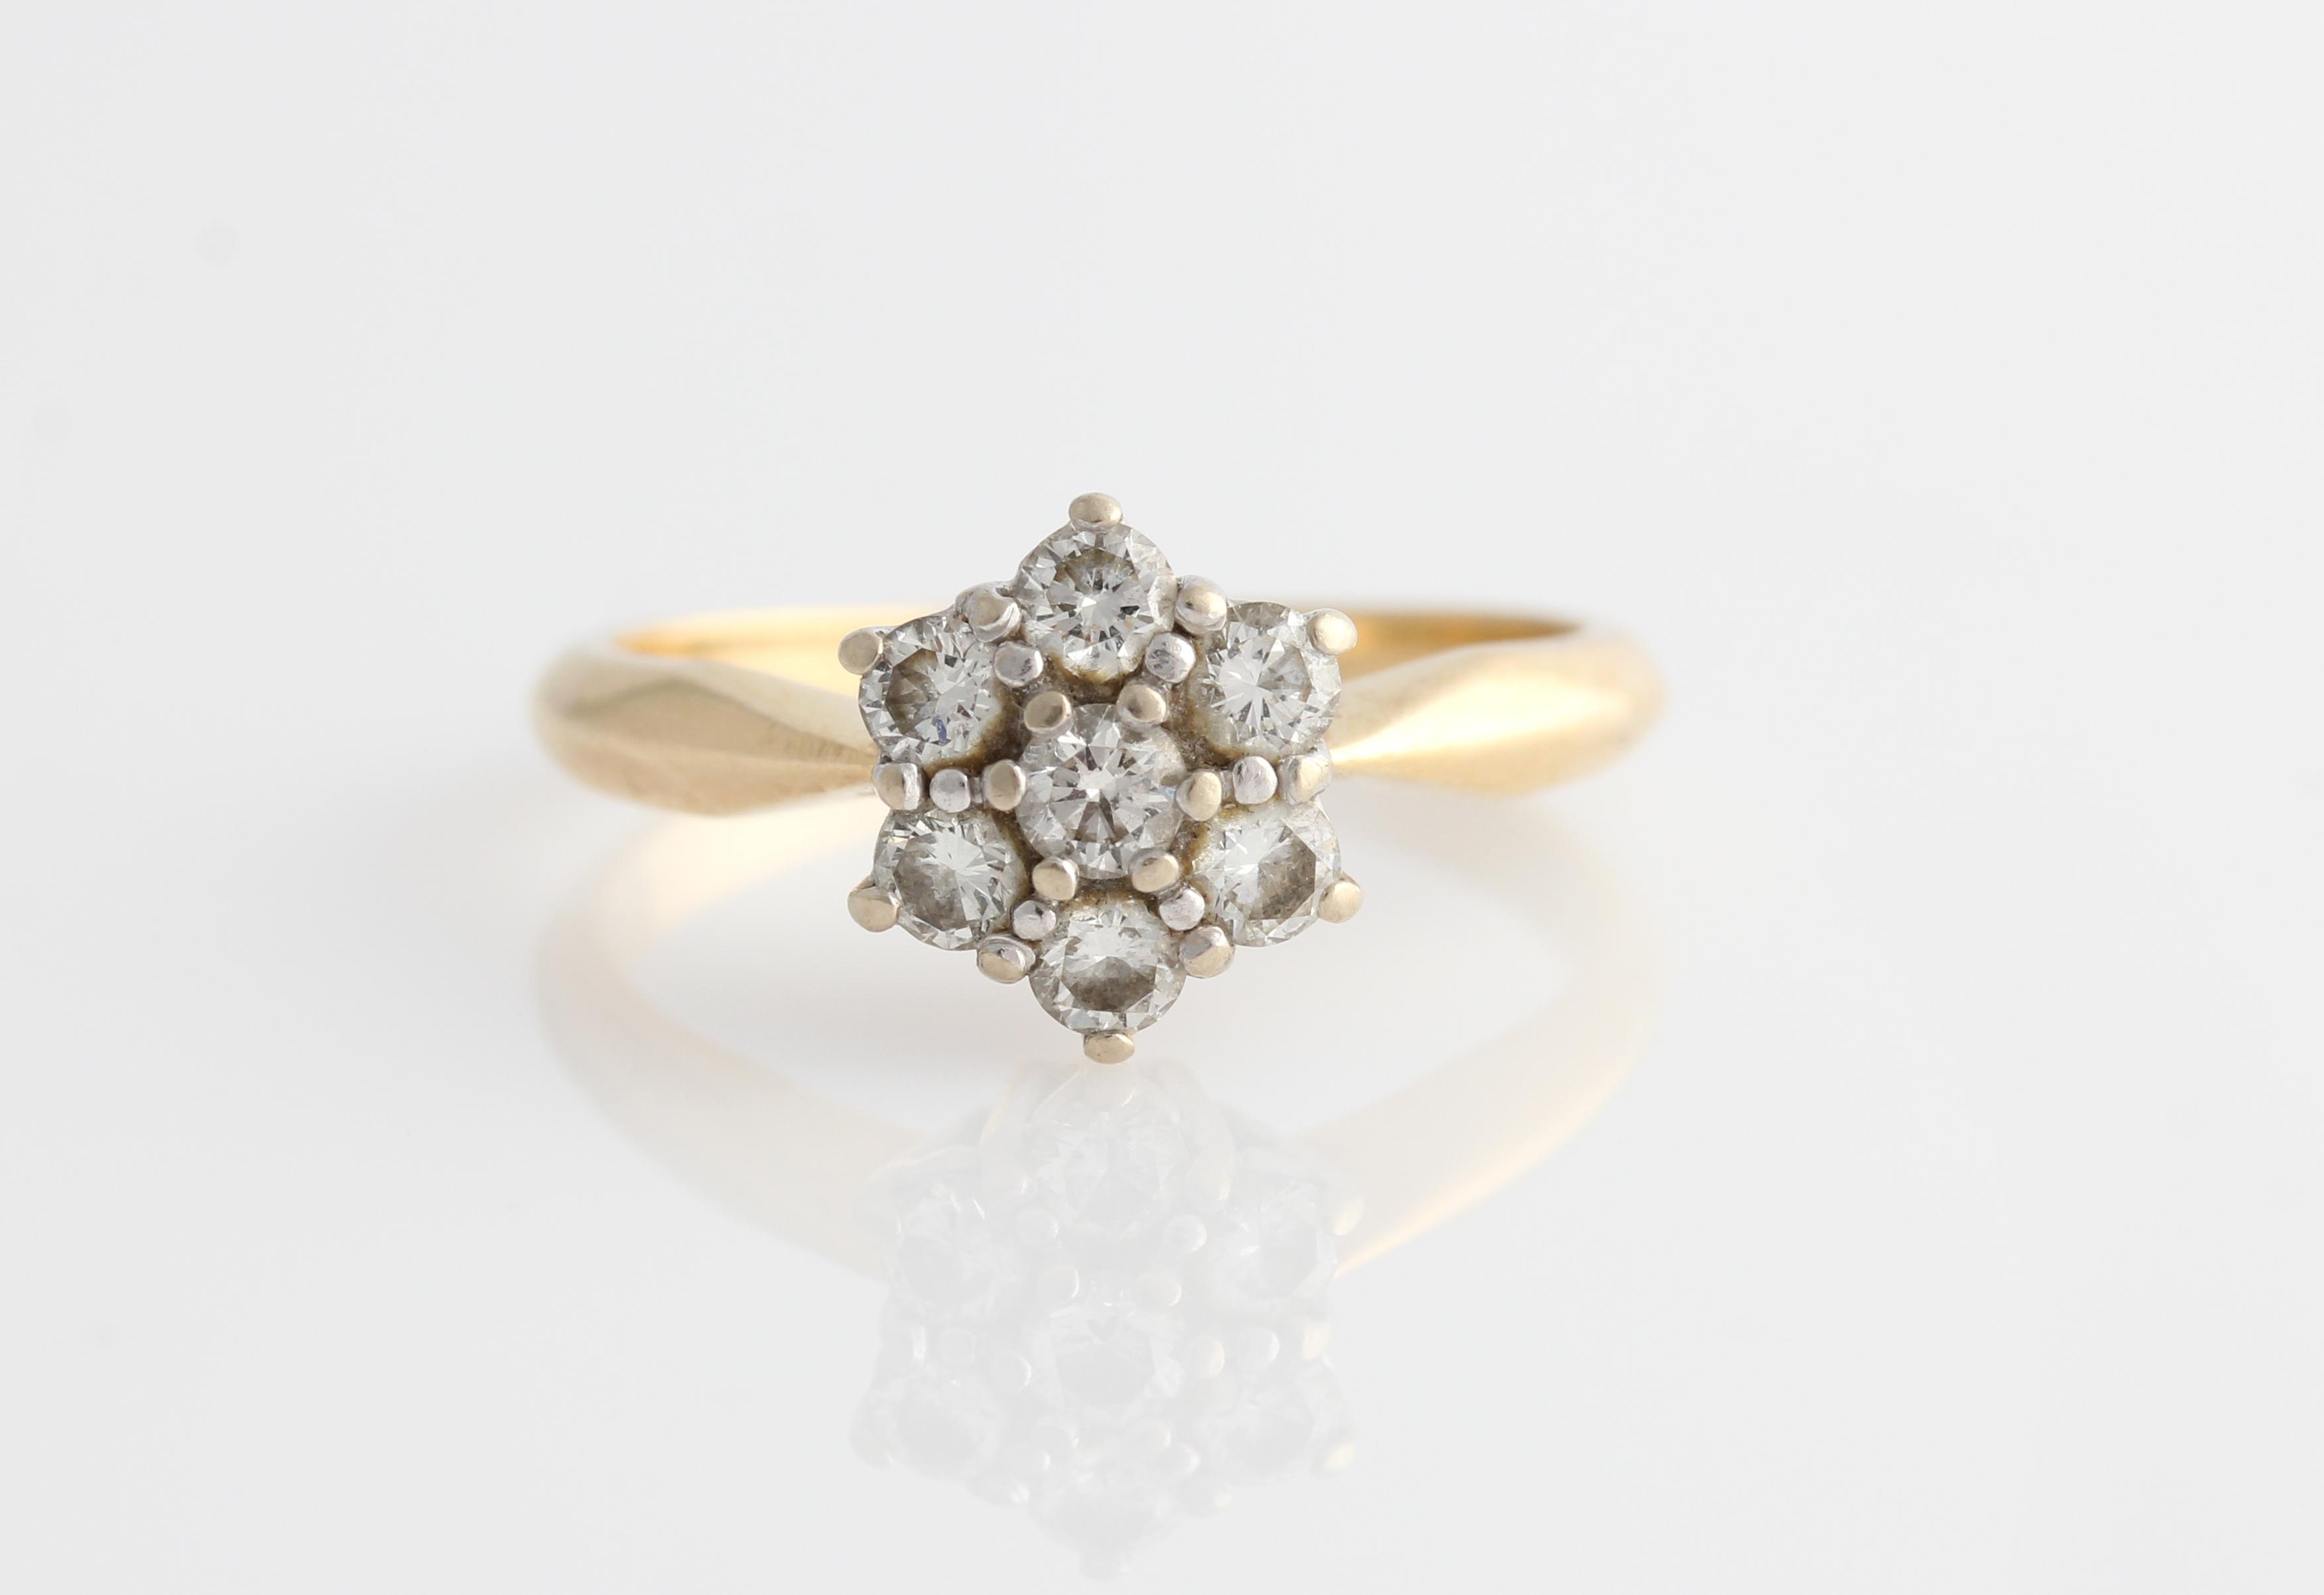 Lot 53 - A diamond flower design ring, set with seven round brilliant cut diamonds, total diamond weight